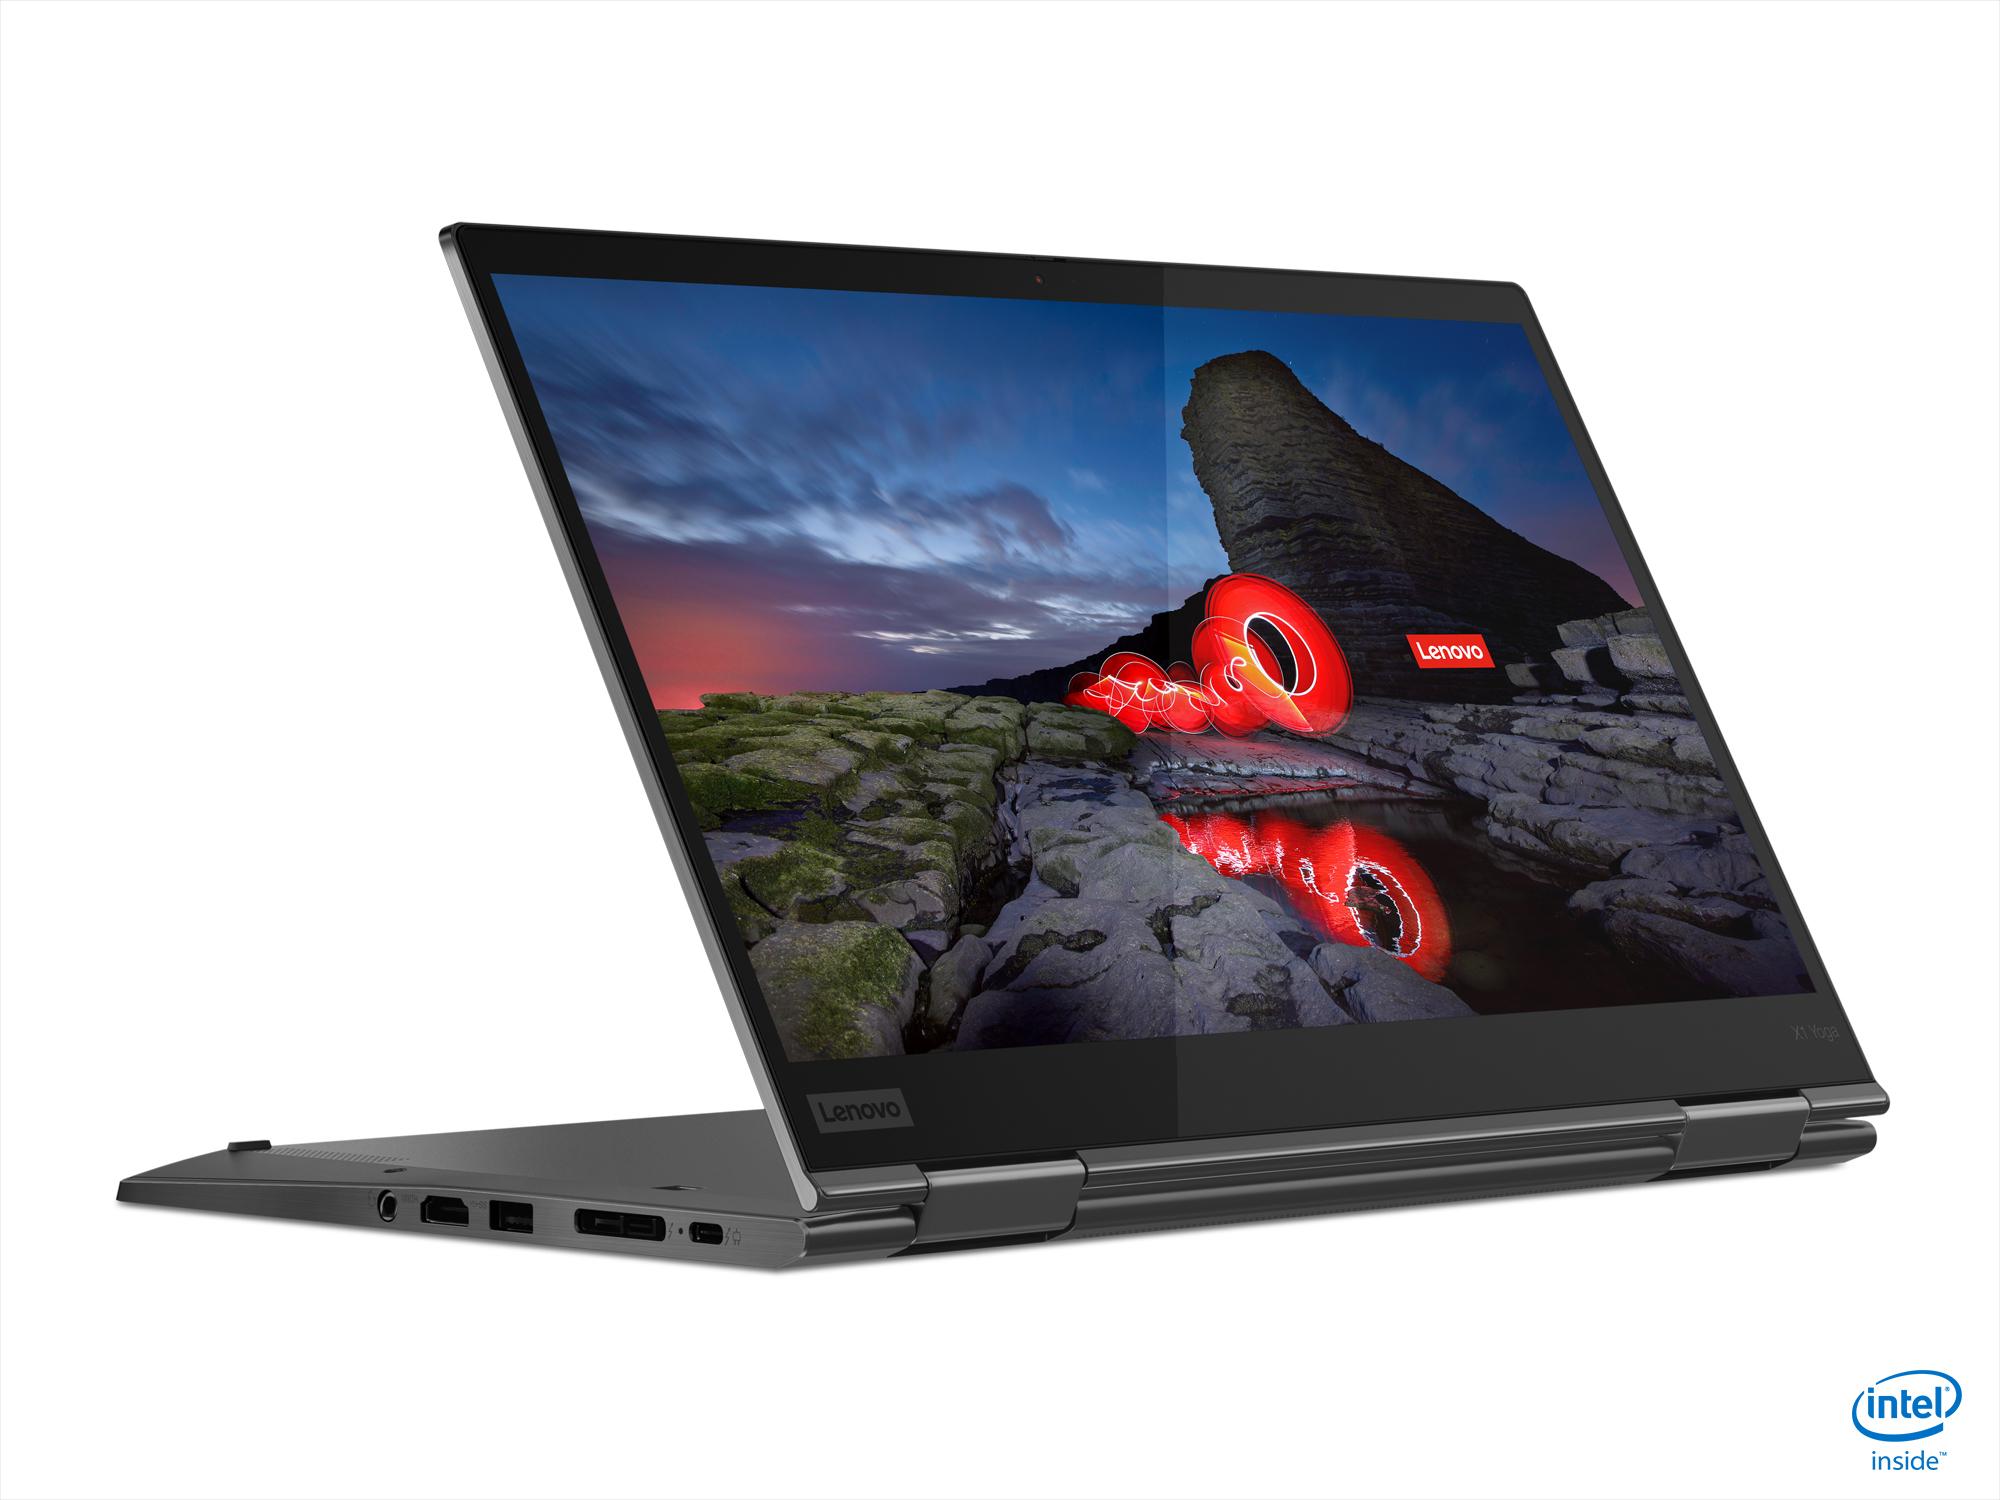 Lenovo's Thinkpad X1 Yoga Gets Bright Display Option & Intel's Latest CPUs